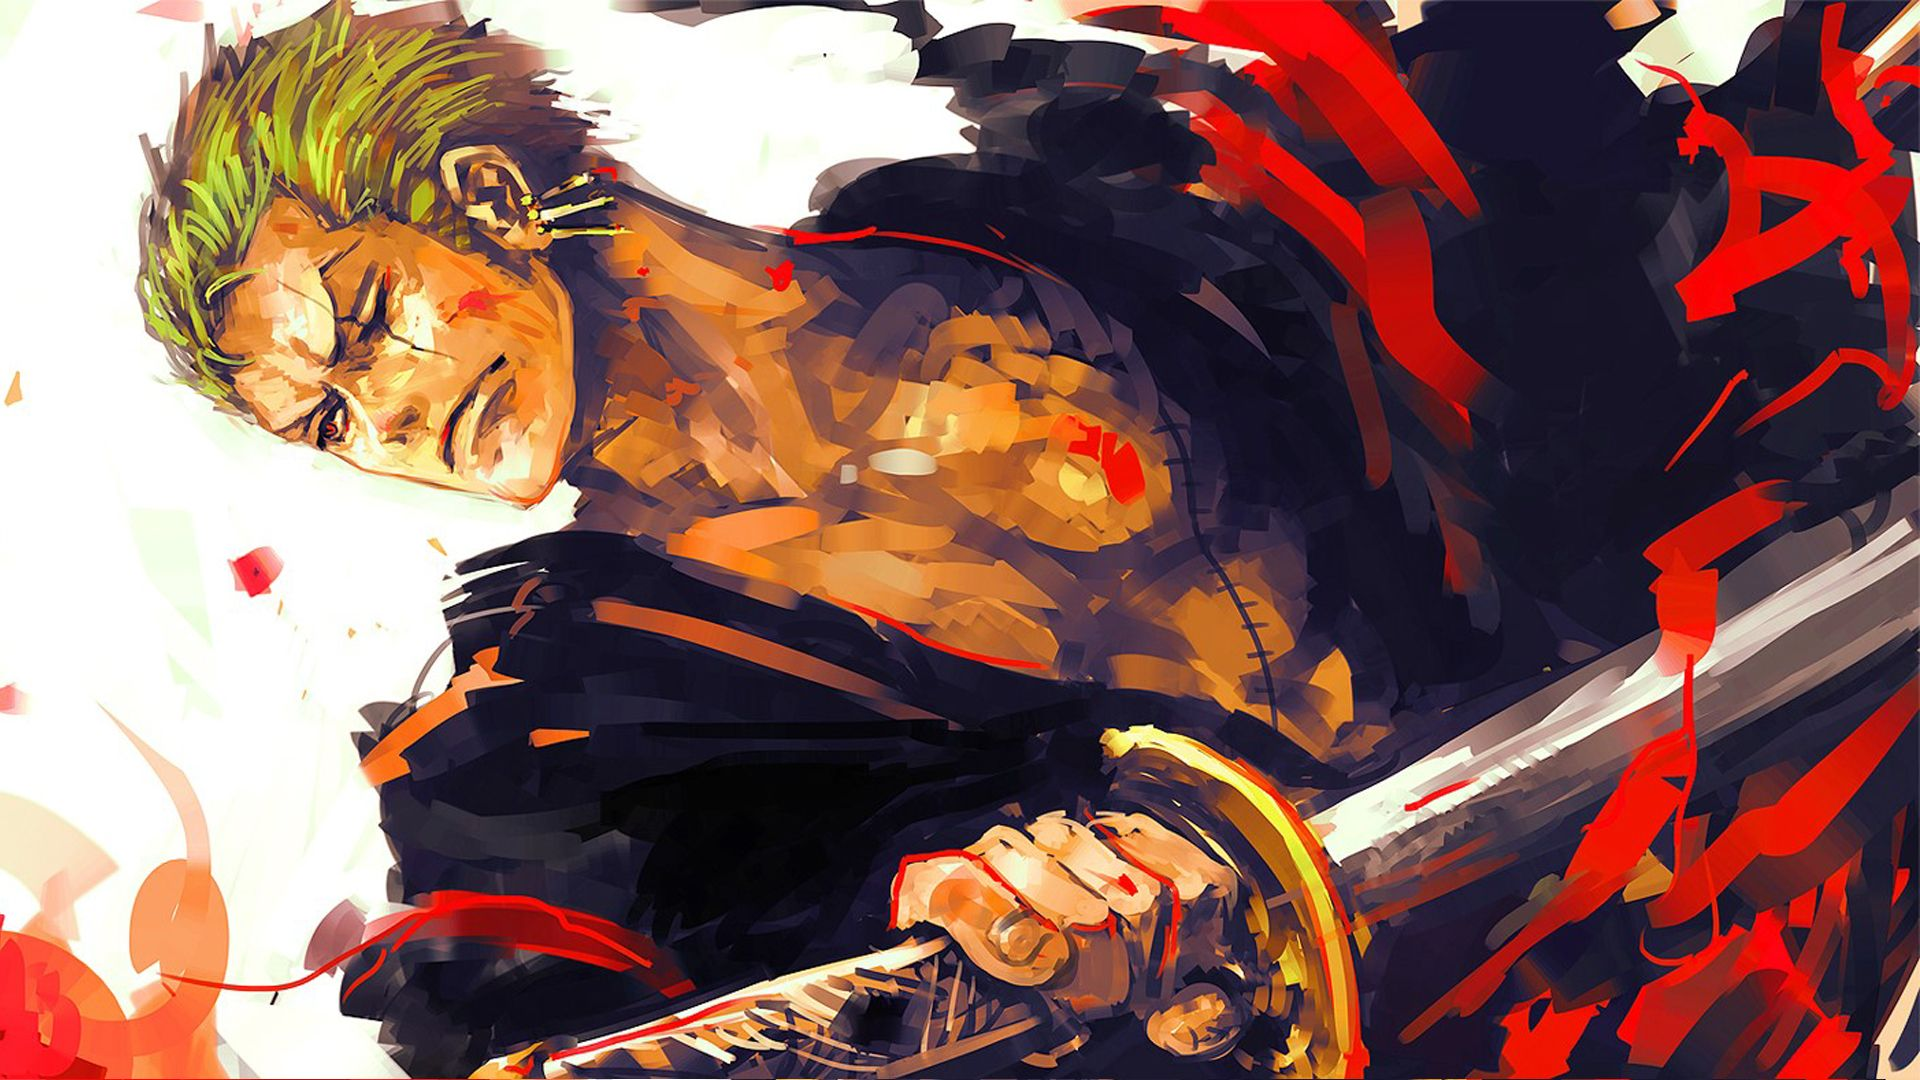 Roronoa Zoro Holdin Katana Anime One Piece Wallpaper Hd Zoro One Piece Roronoa Zoro Anime Wallpaper